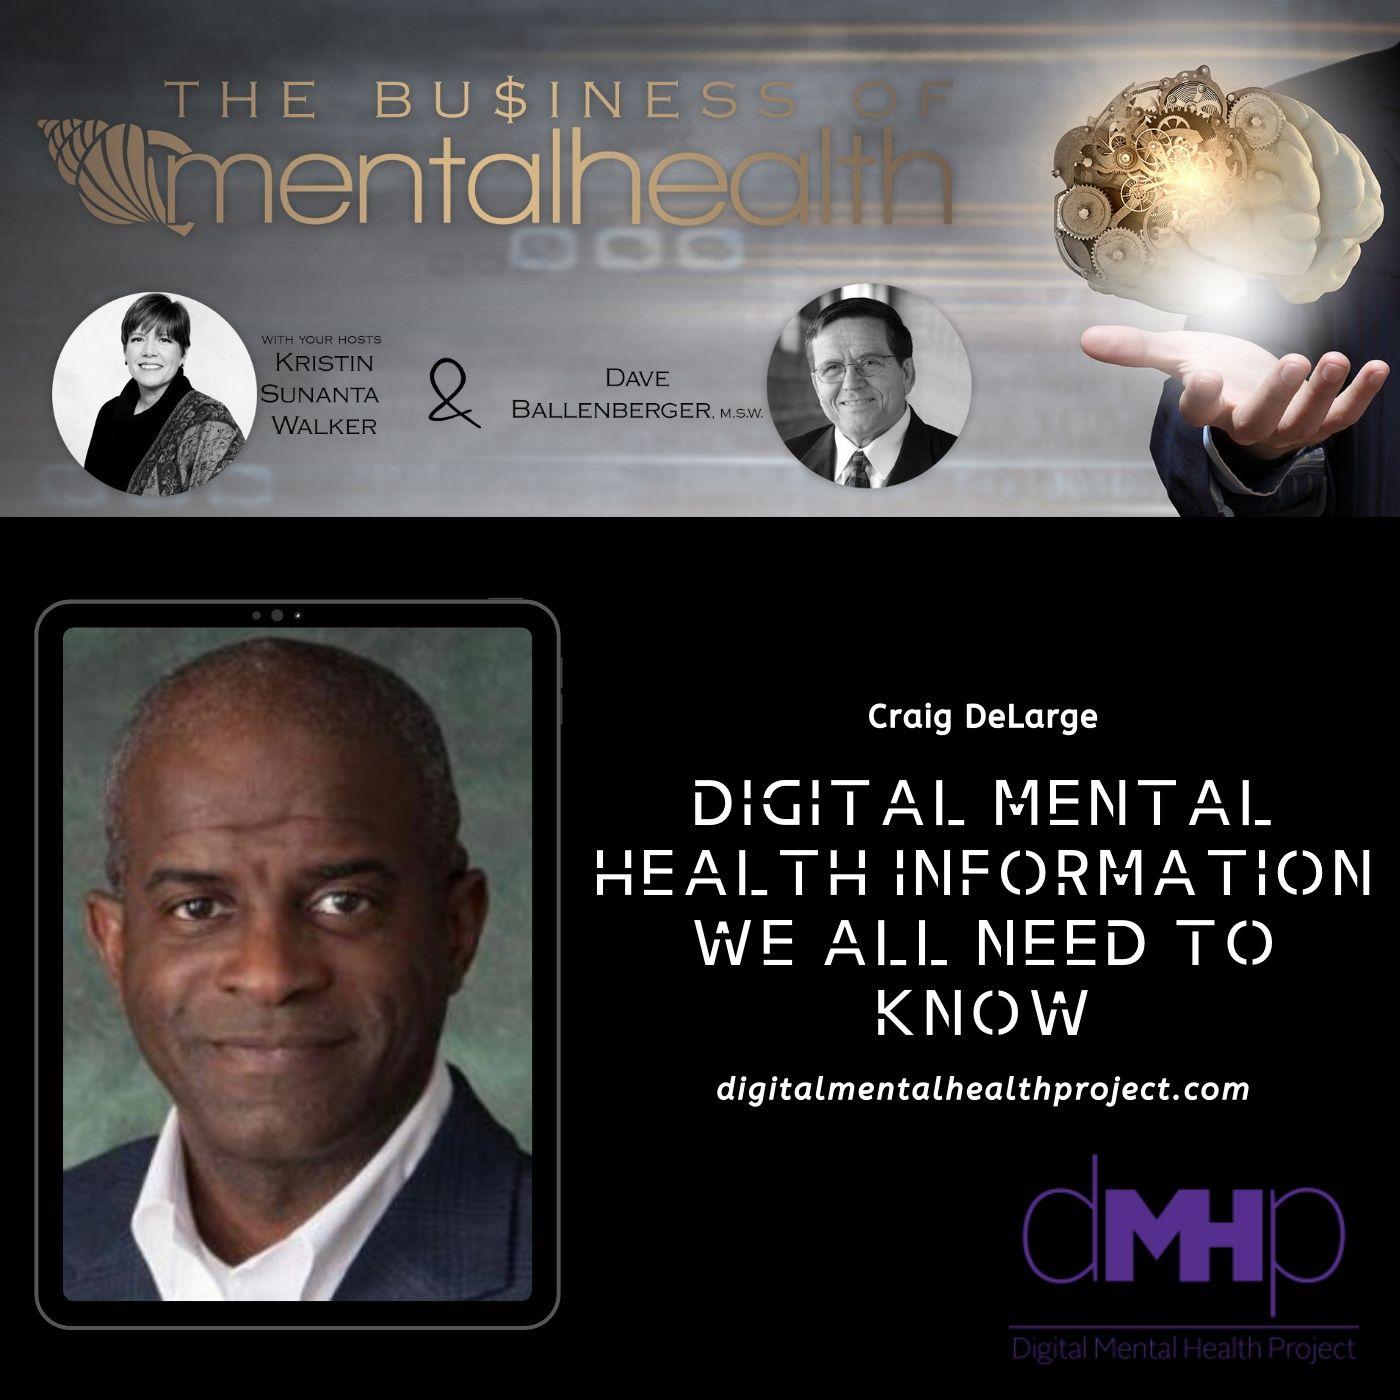 Mental Health News Radio - Digital Mental Health Information We All Need to Know